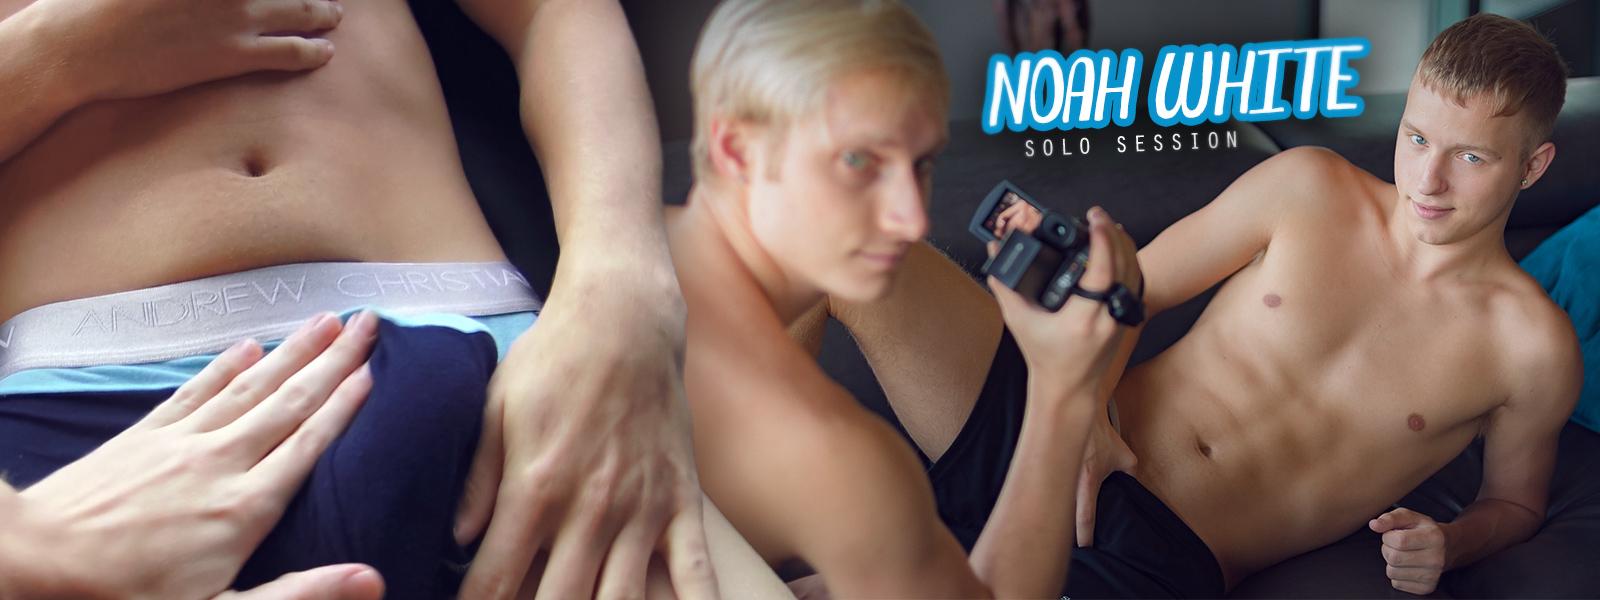 Noah White Solo Session